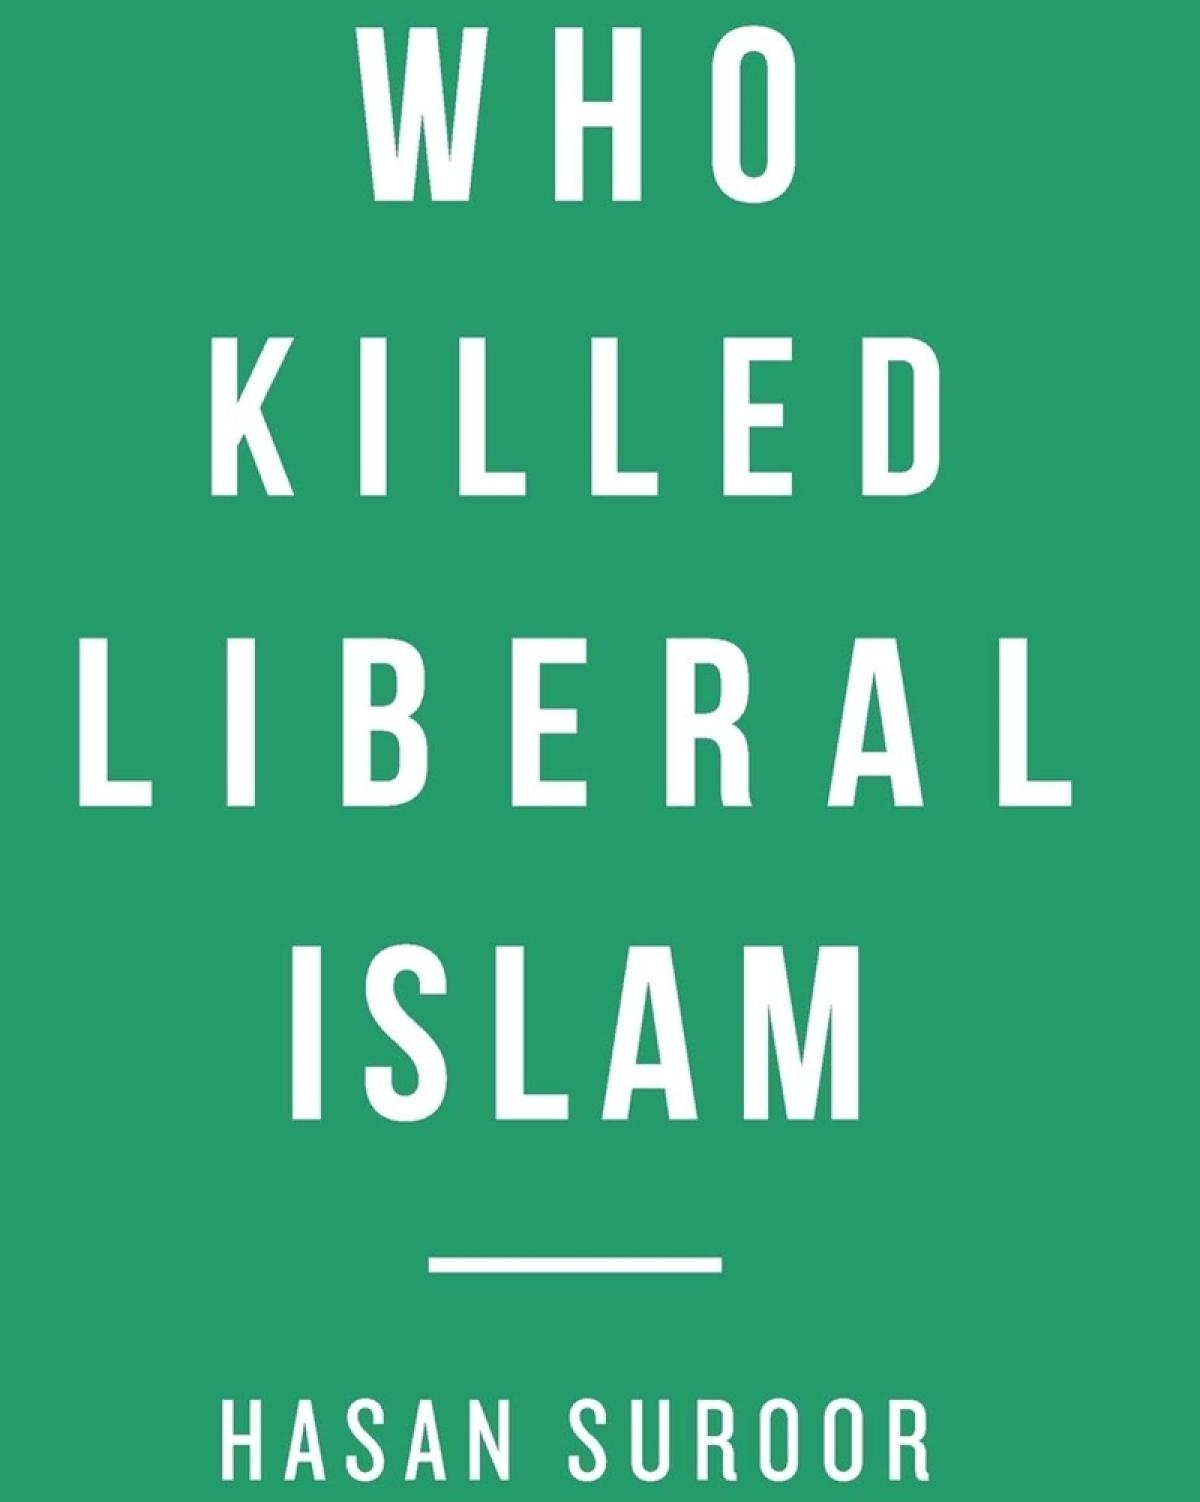 Book Review: Crisis of liberalism in Indian Muslims